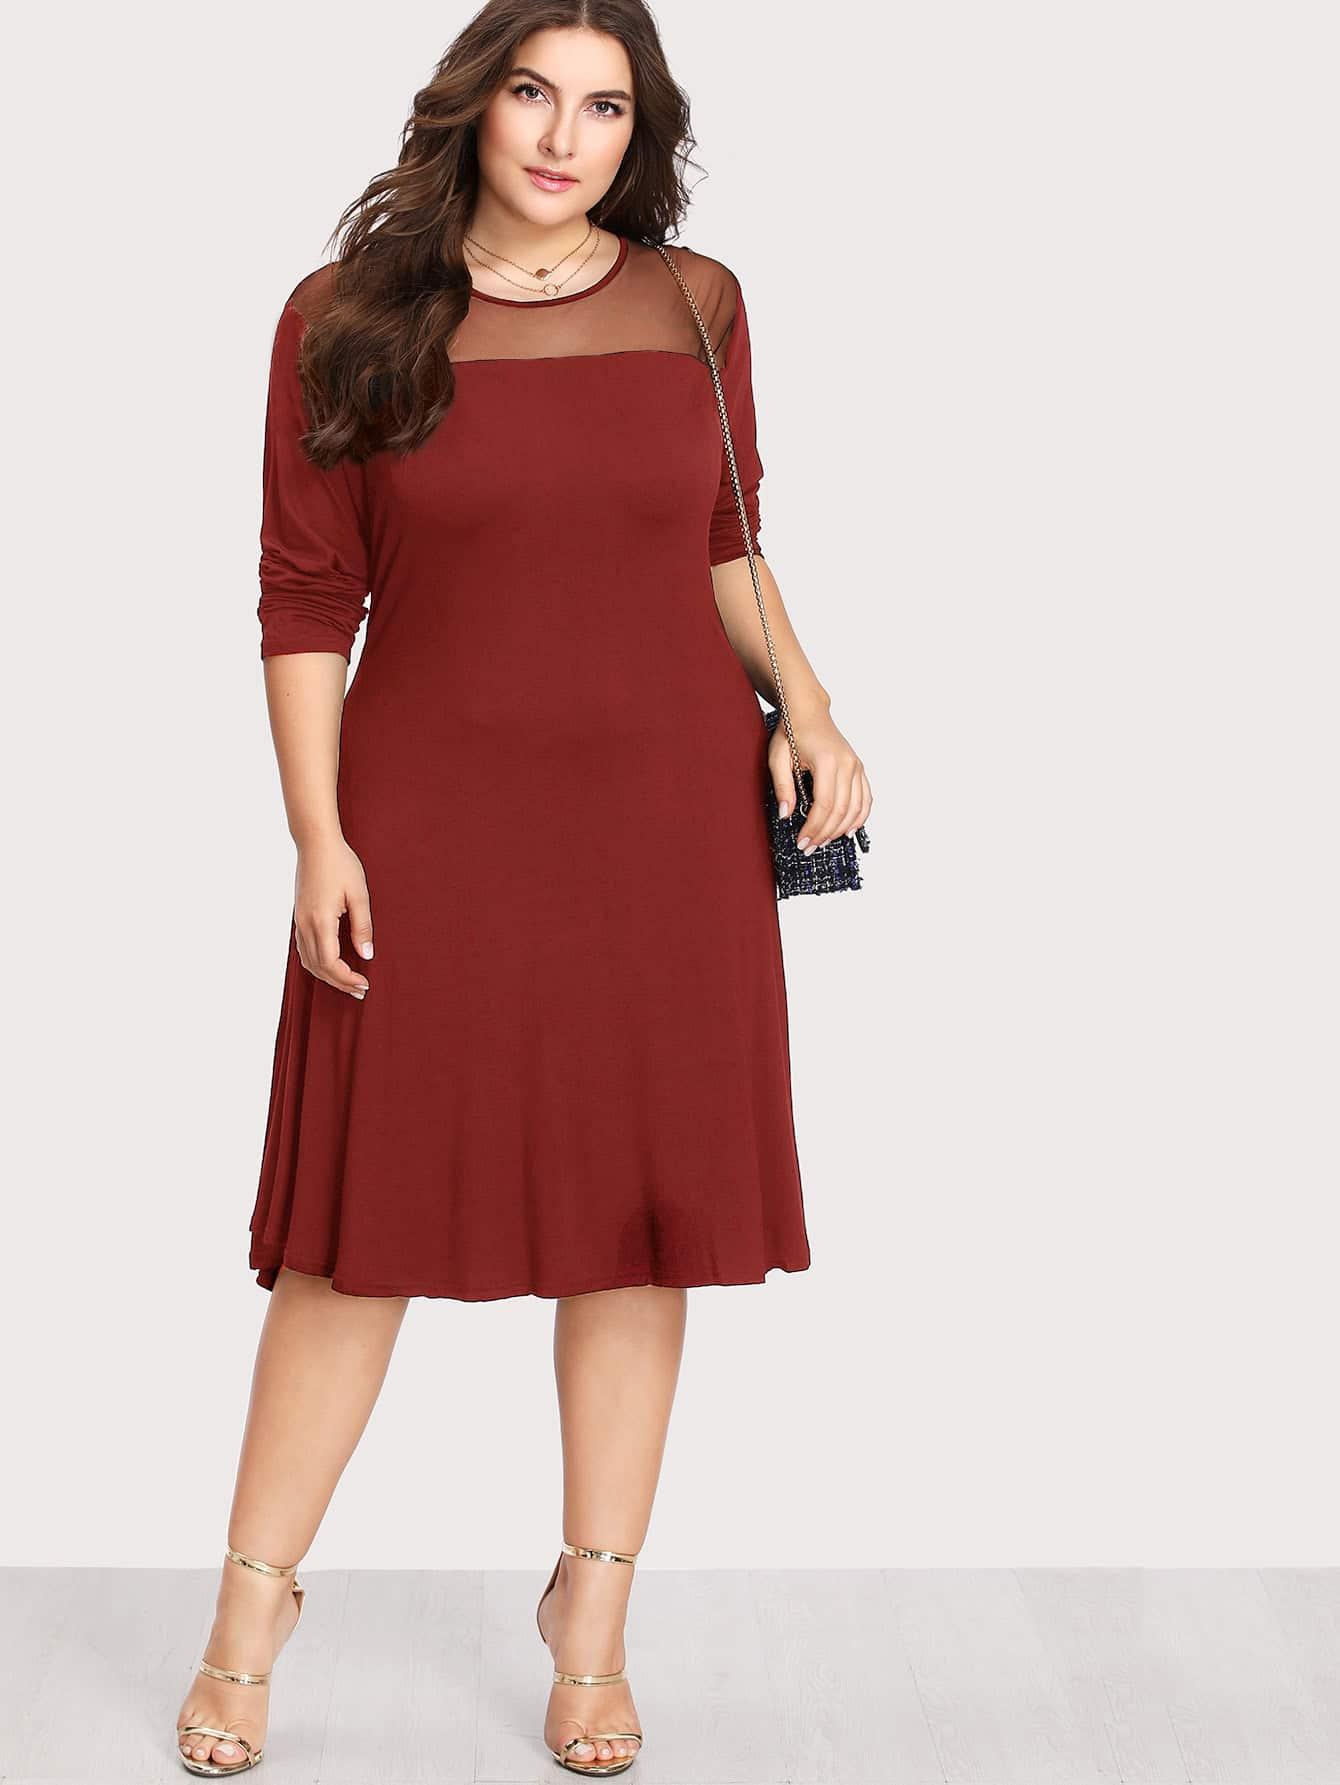 Mesh Insert Dress sequin mesh insert bodycon club dress